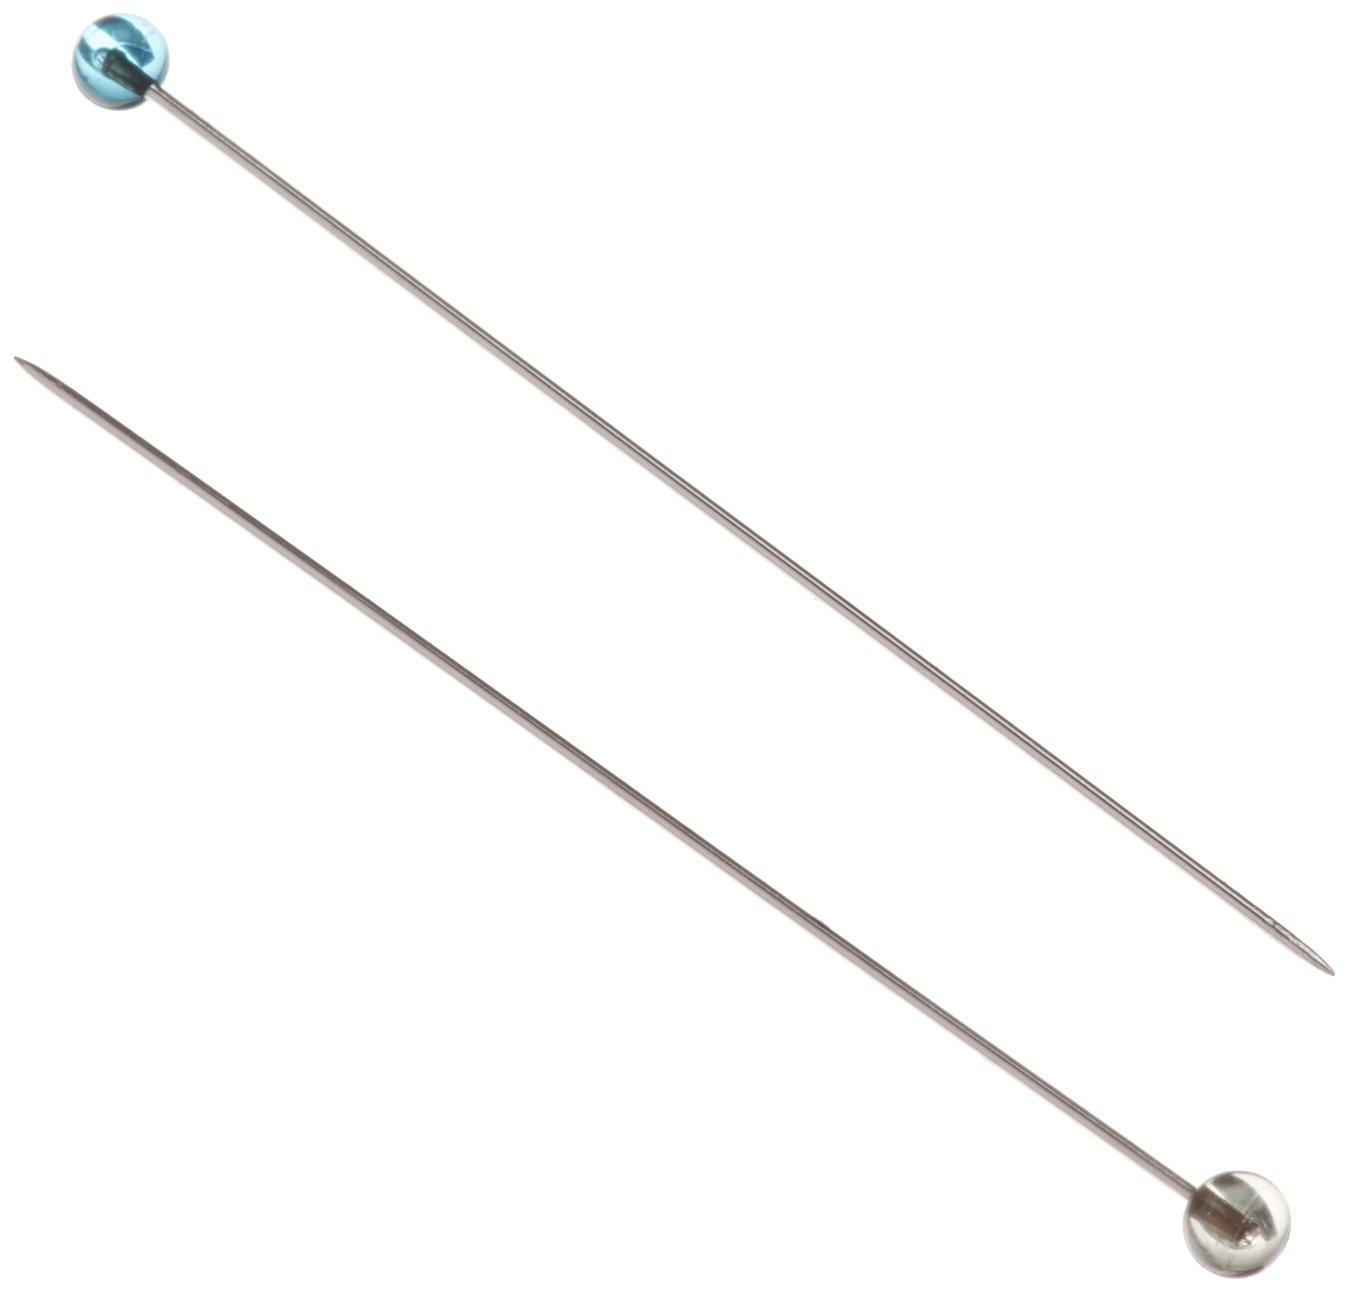 100PK OF CRYSTAL GLASS HEAD PINS, FINE SHARP-1 7/8, .5MM STEEL SHAFT Vista Partners COL110